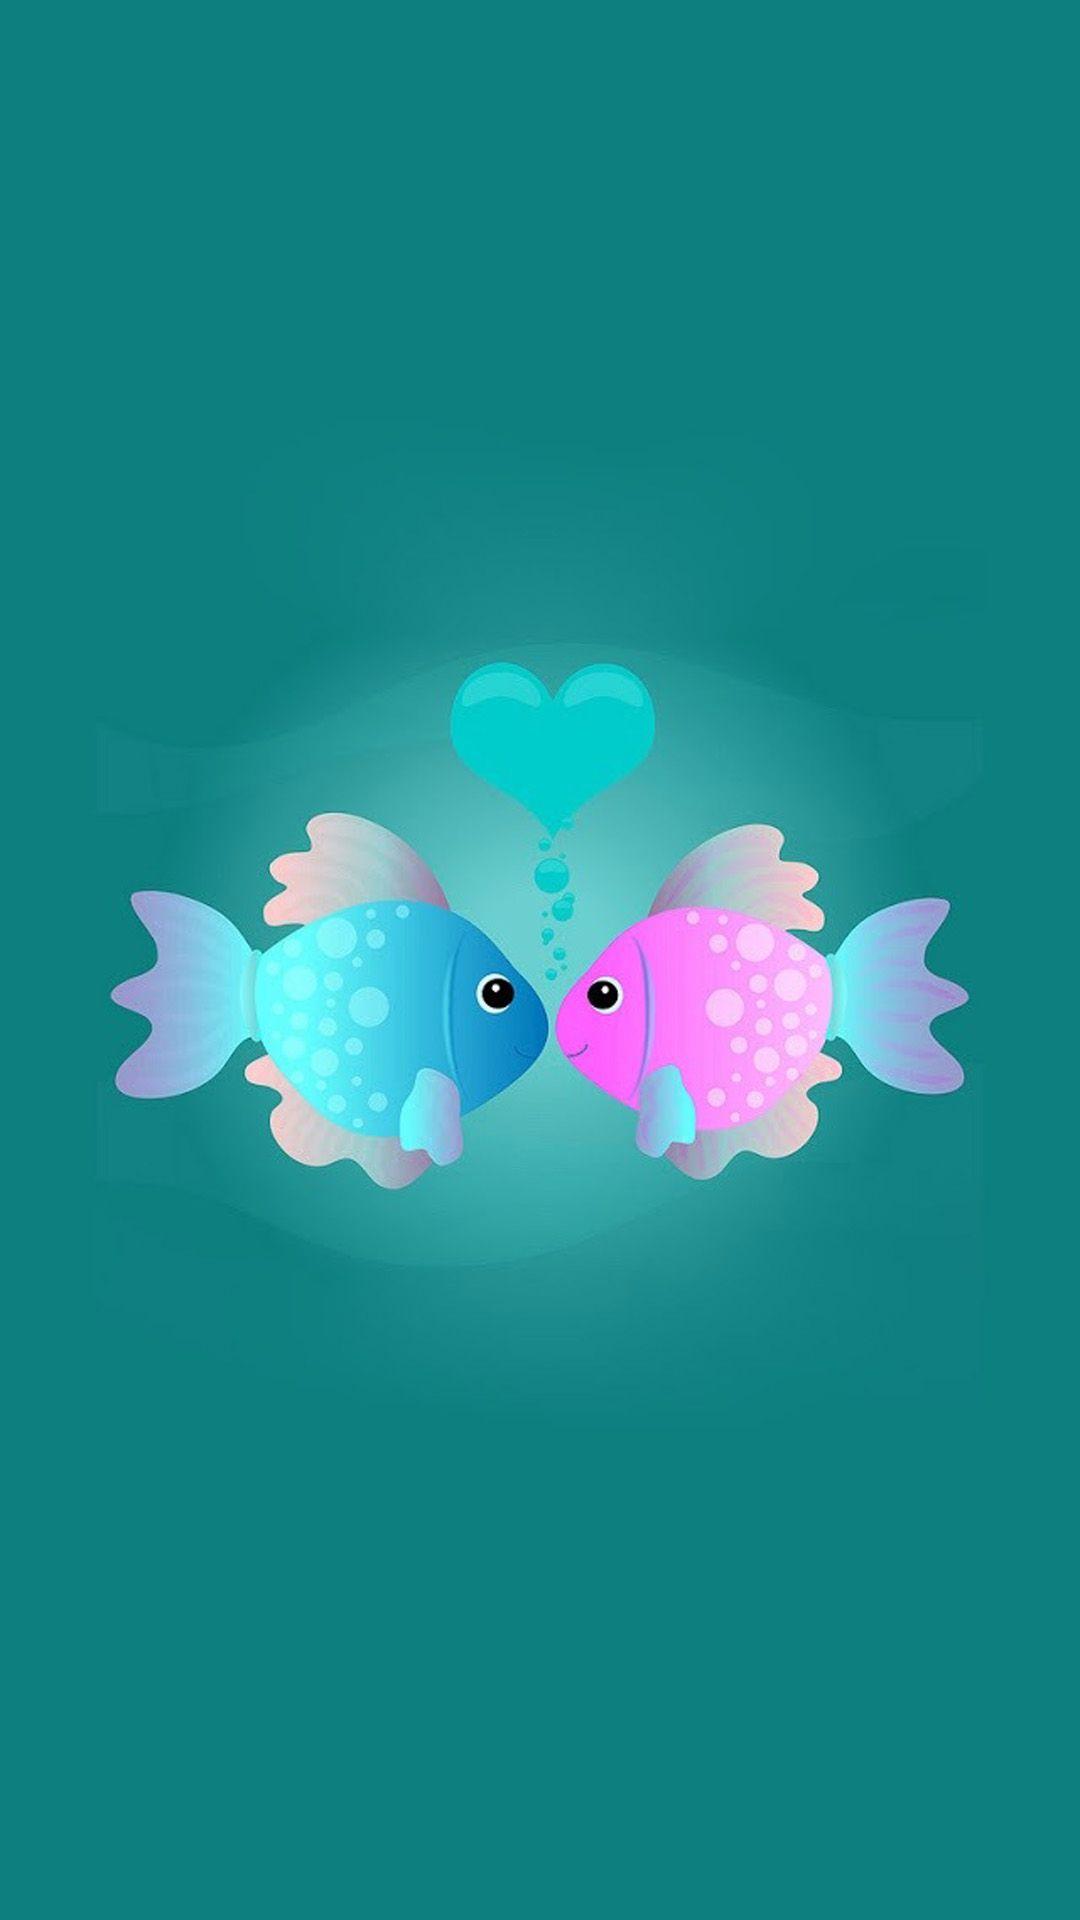 Cartoon Kissing Fish Stock Vector Illustration Of Cute